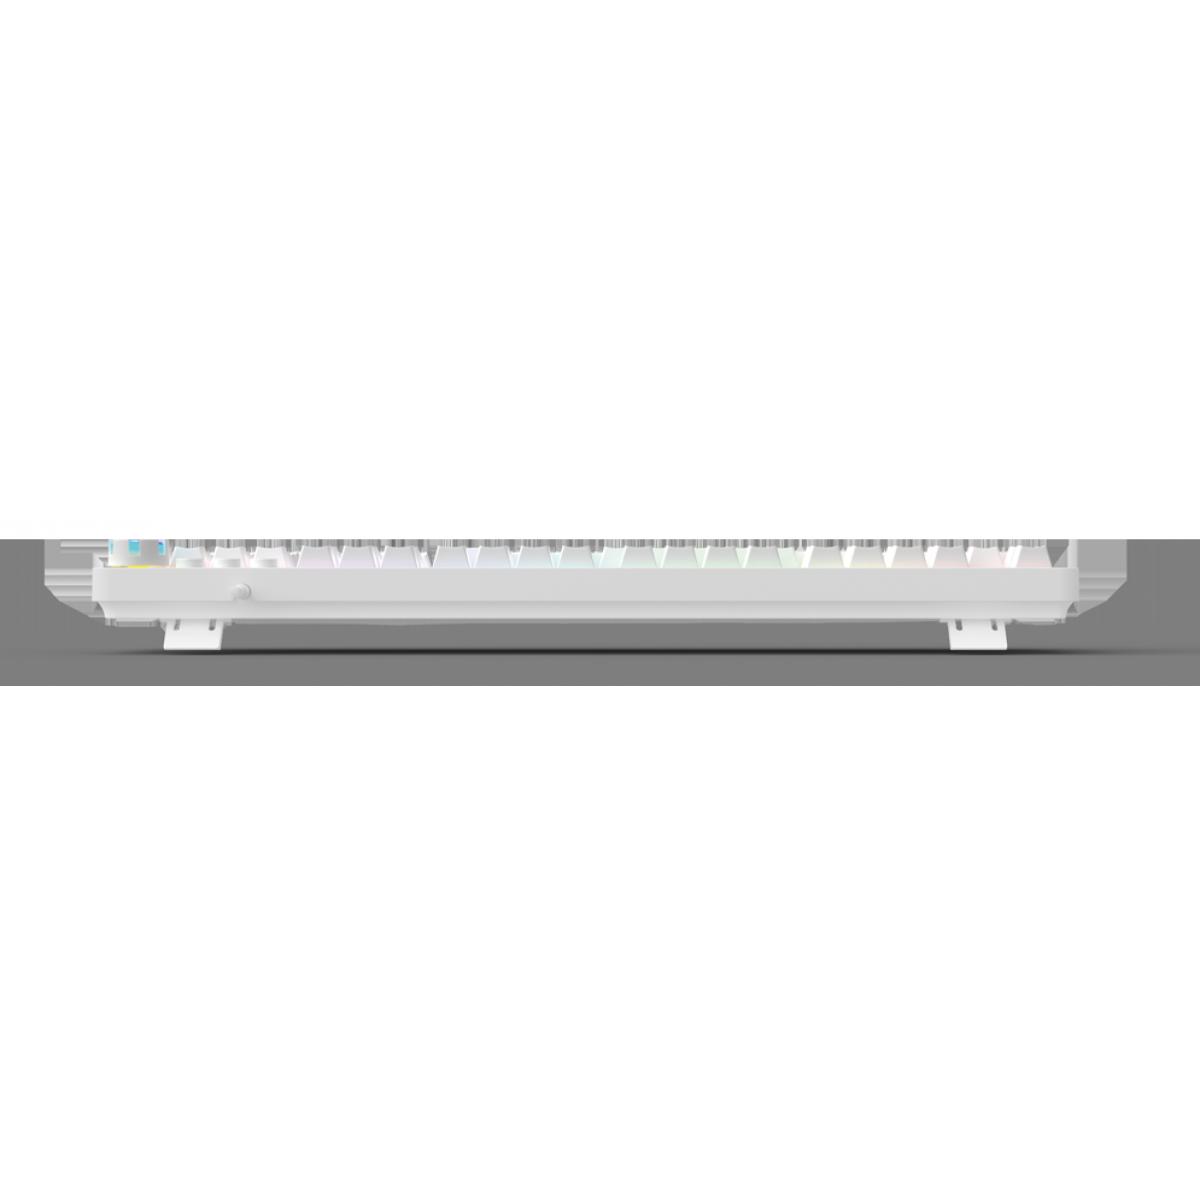 Teclado Gamer Mecânico Fantech Max Core Edição Space, RGB, Switch Brown, White, MK852